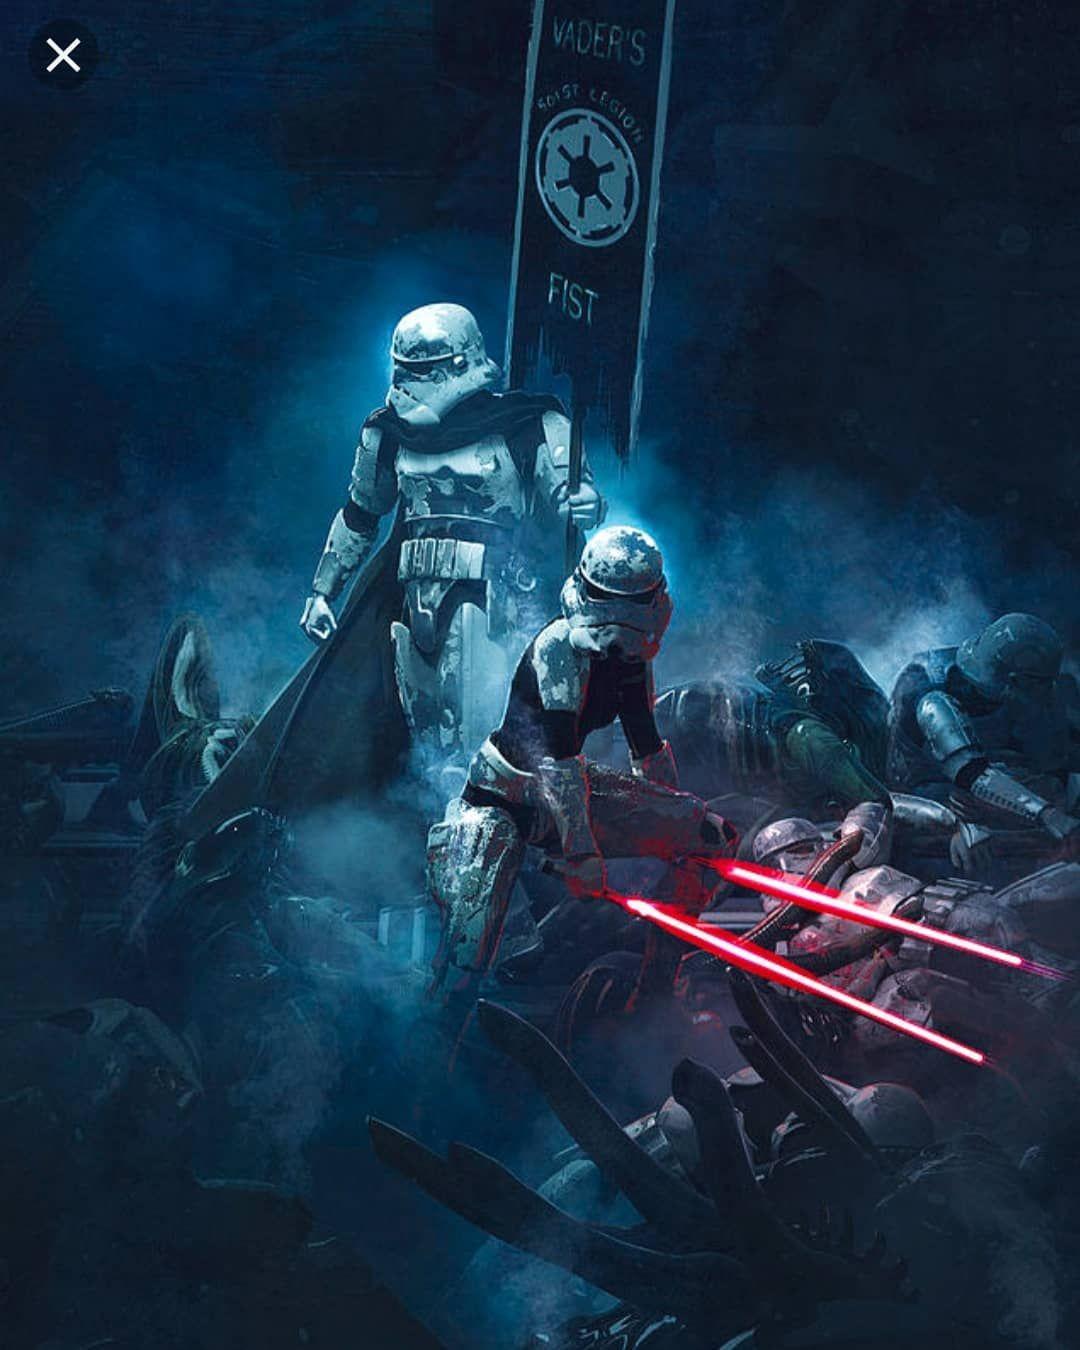 Star Wars Kylo Ren Army Iphone Wallpaper Star Wars Drawings Star Wars Background Star Wars Wallpaper